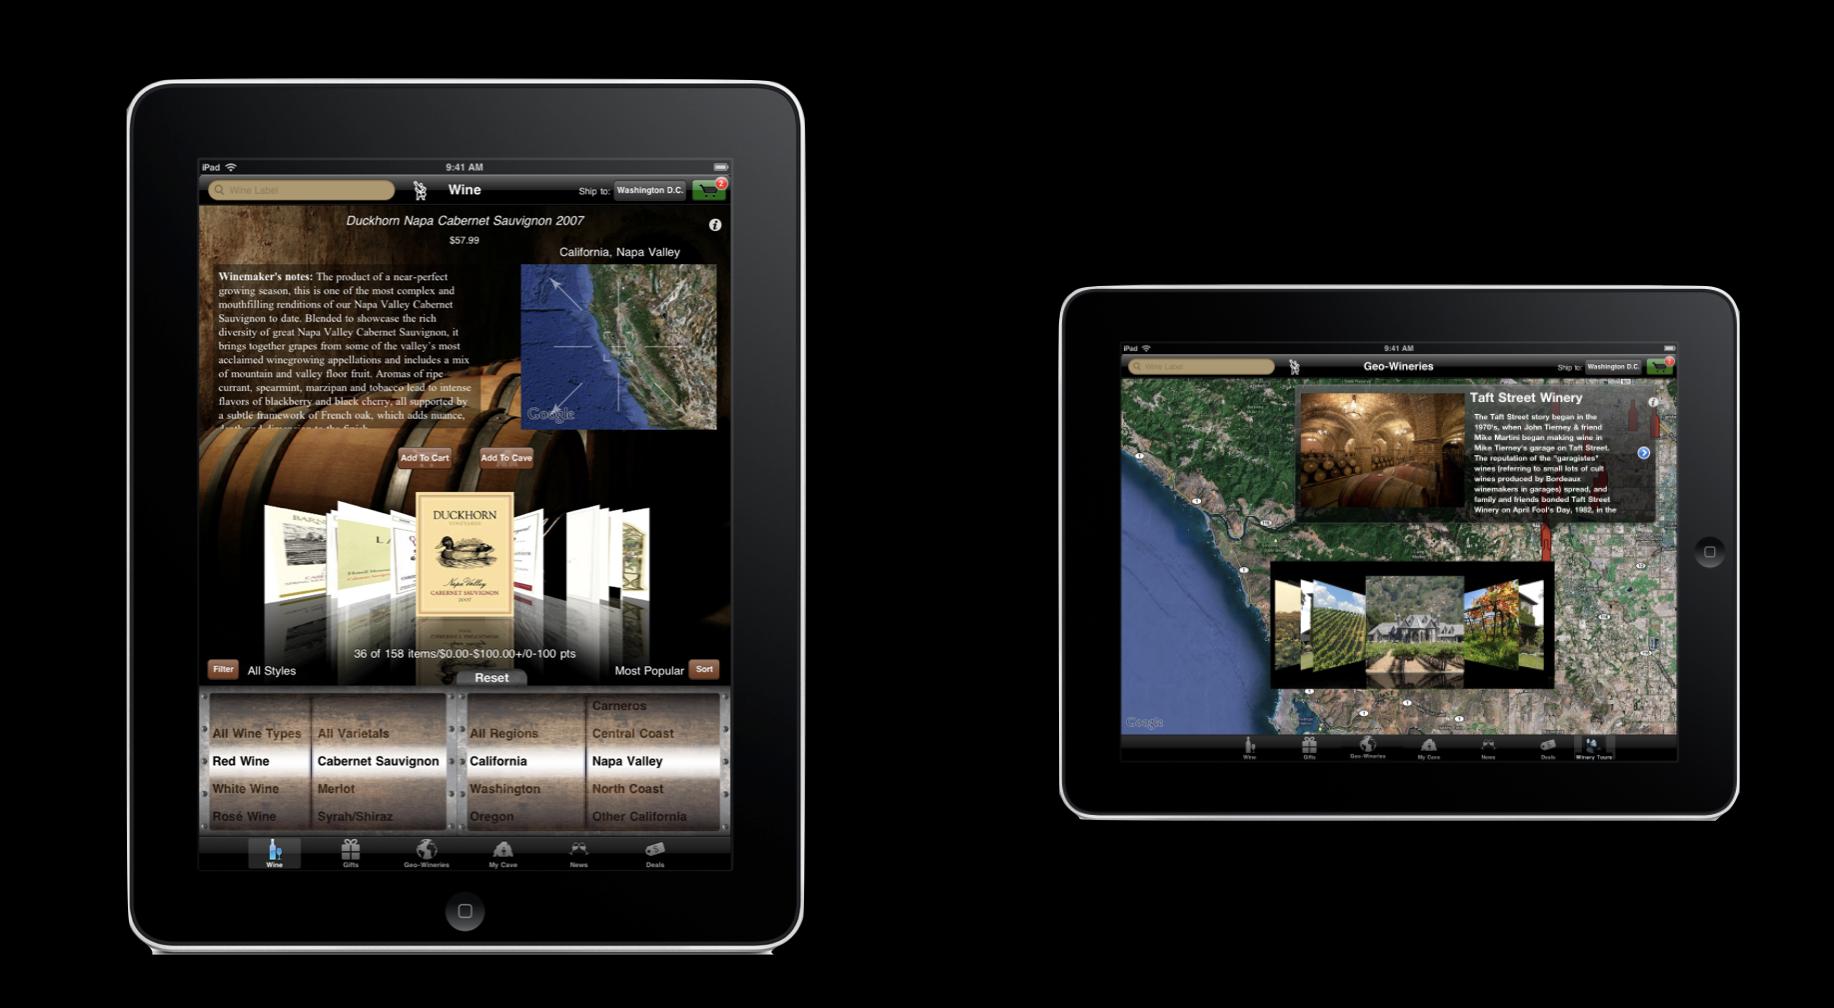 Wine.com iPad App